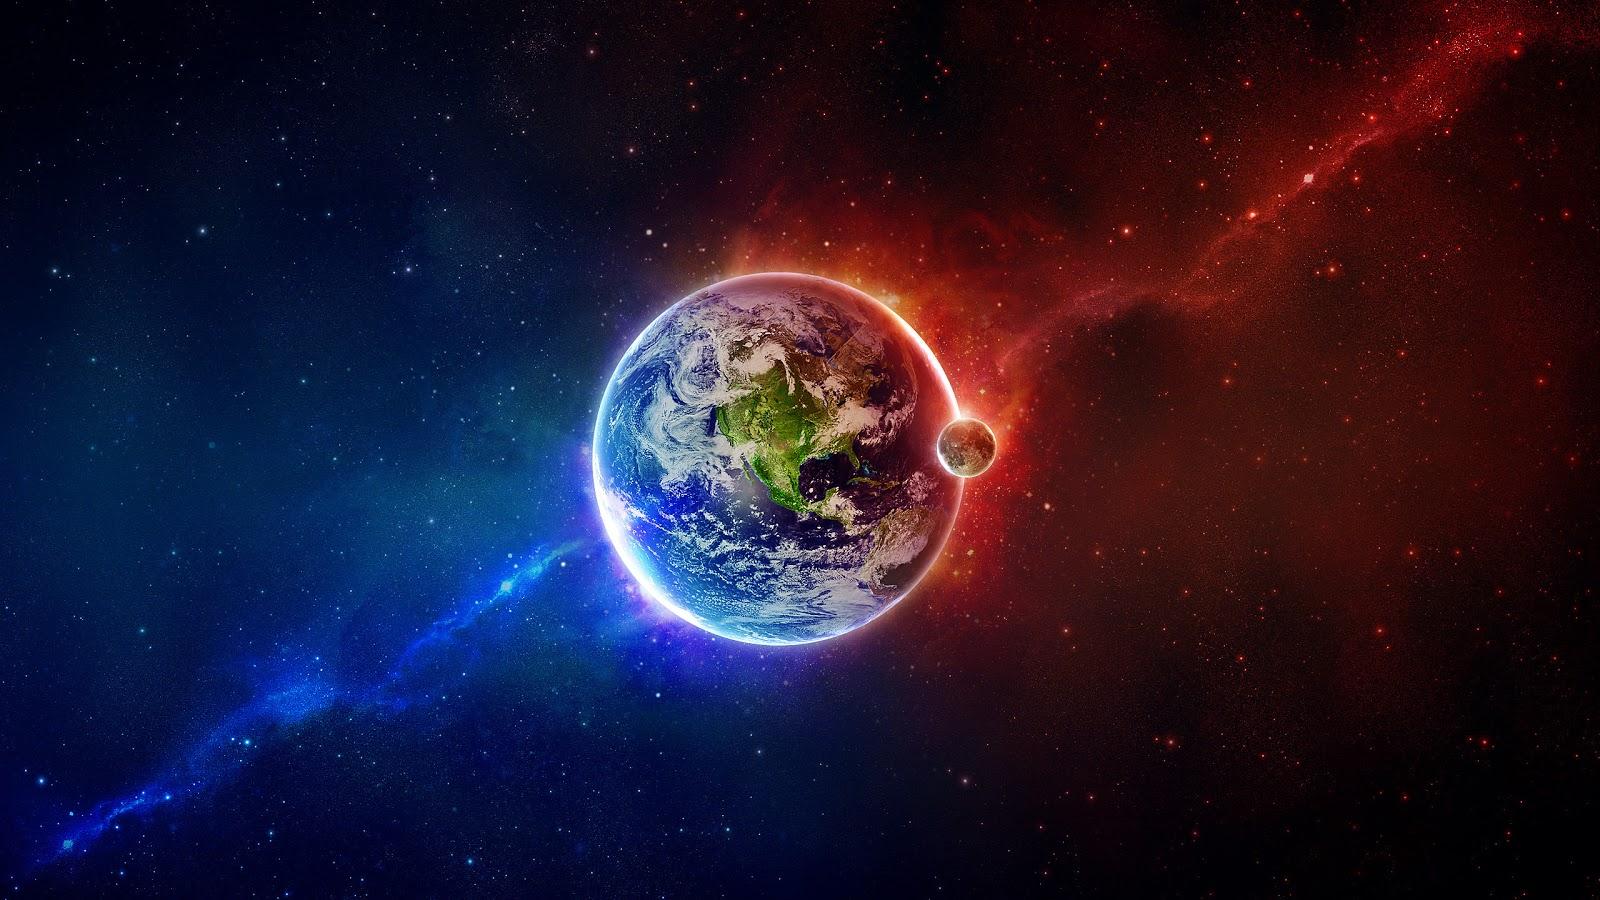 earth planet hd - photo #35